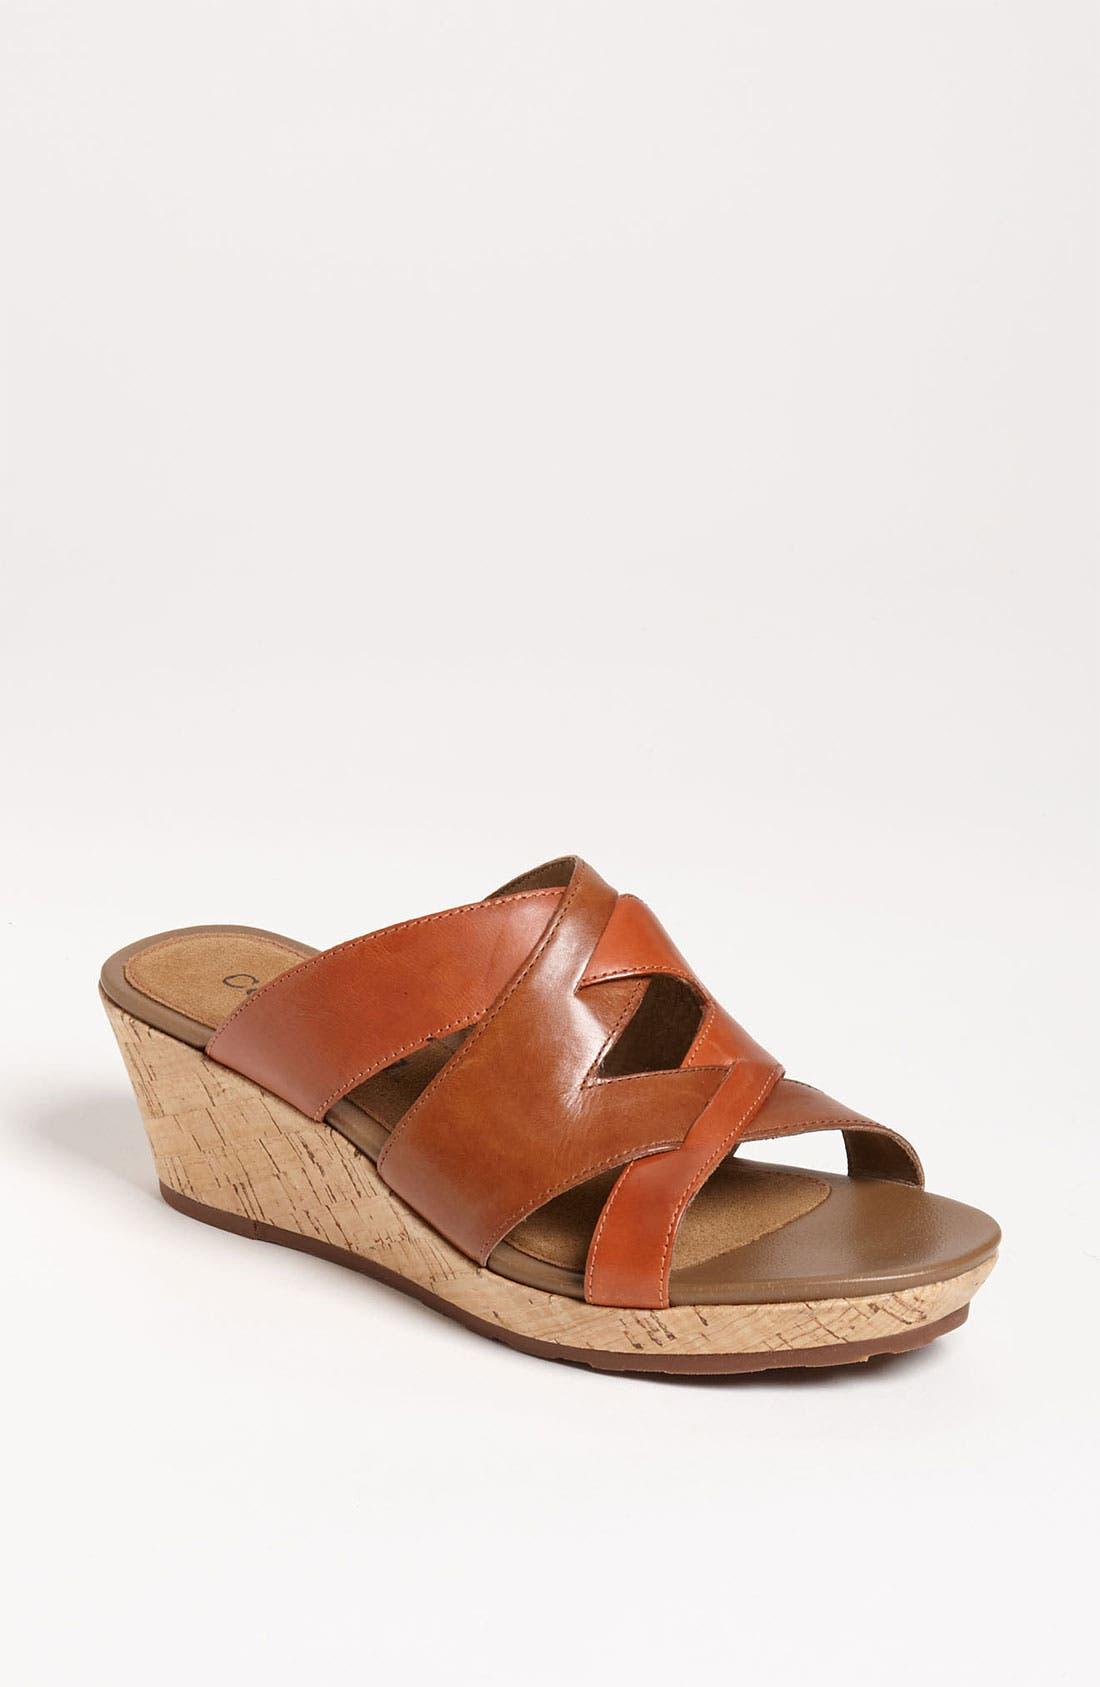 Alternate Image 1 Selected - Cobb Hill 'Natasha' Sandal